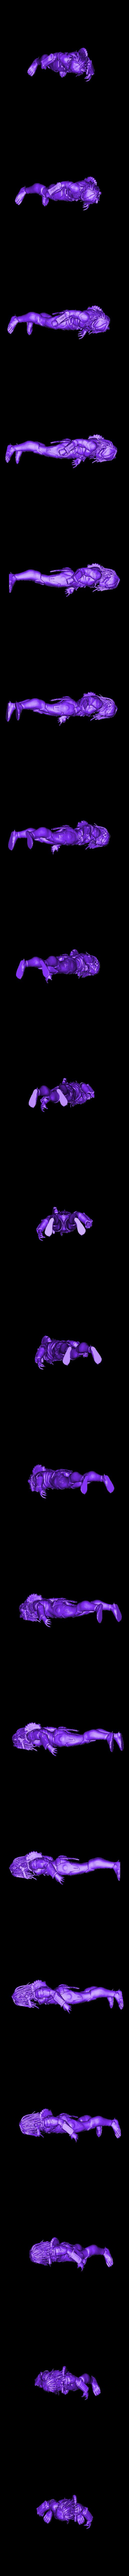 Predator.stl Download free STL file Predator • 3D printable template, DarkRadamanthys